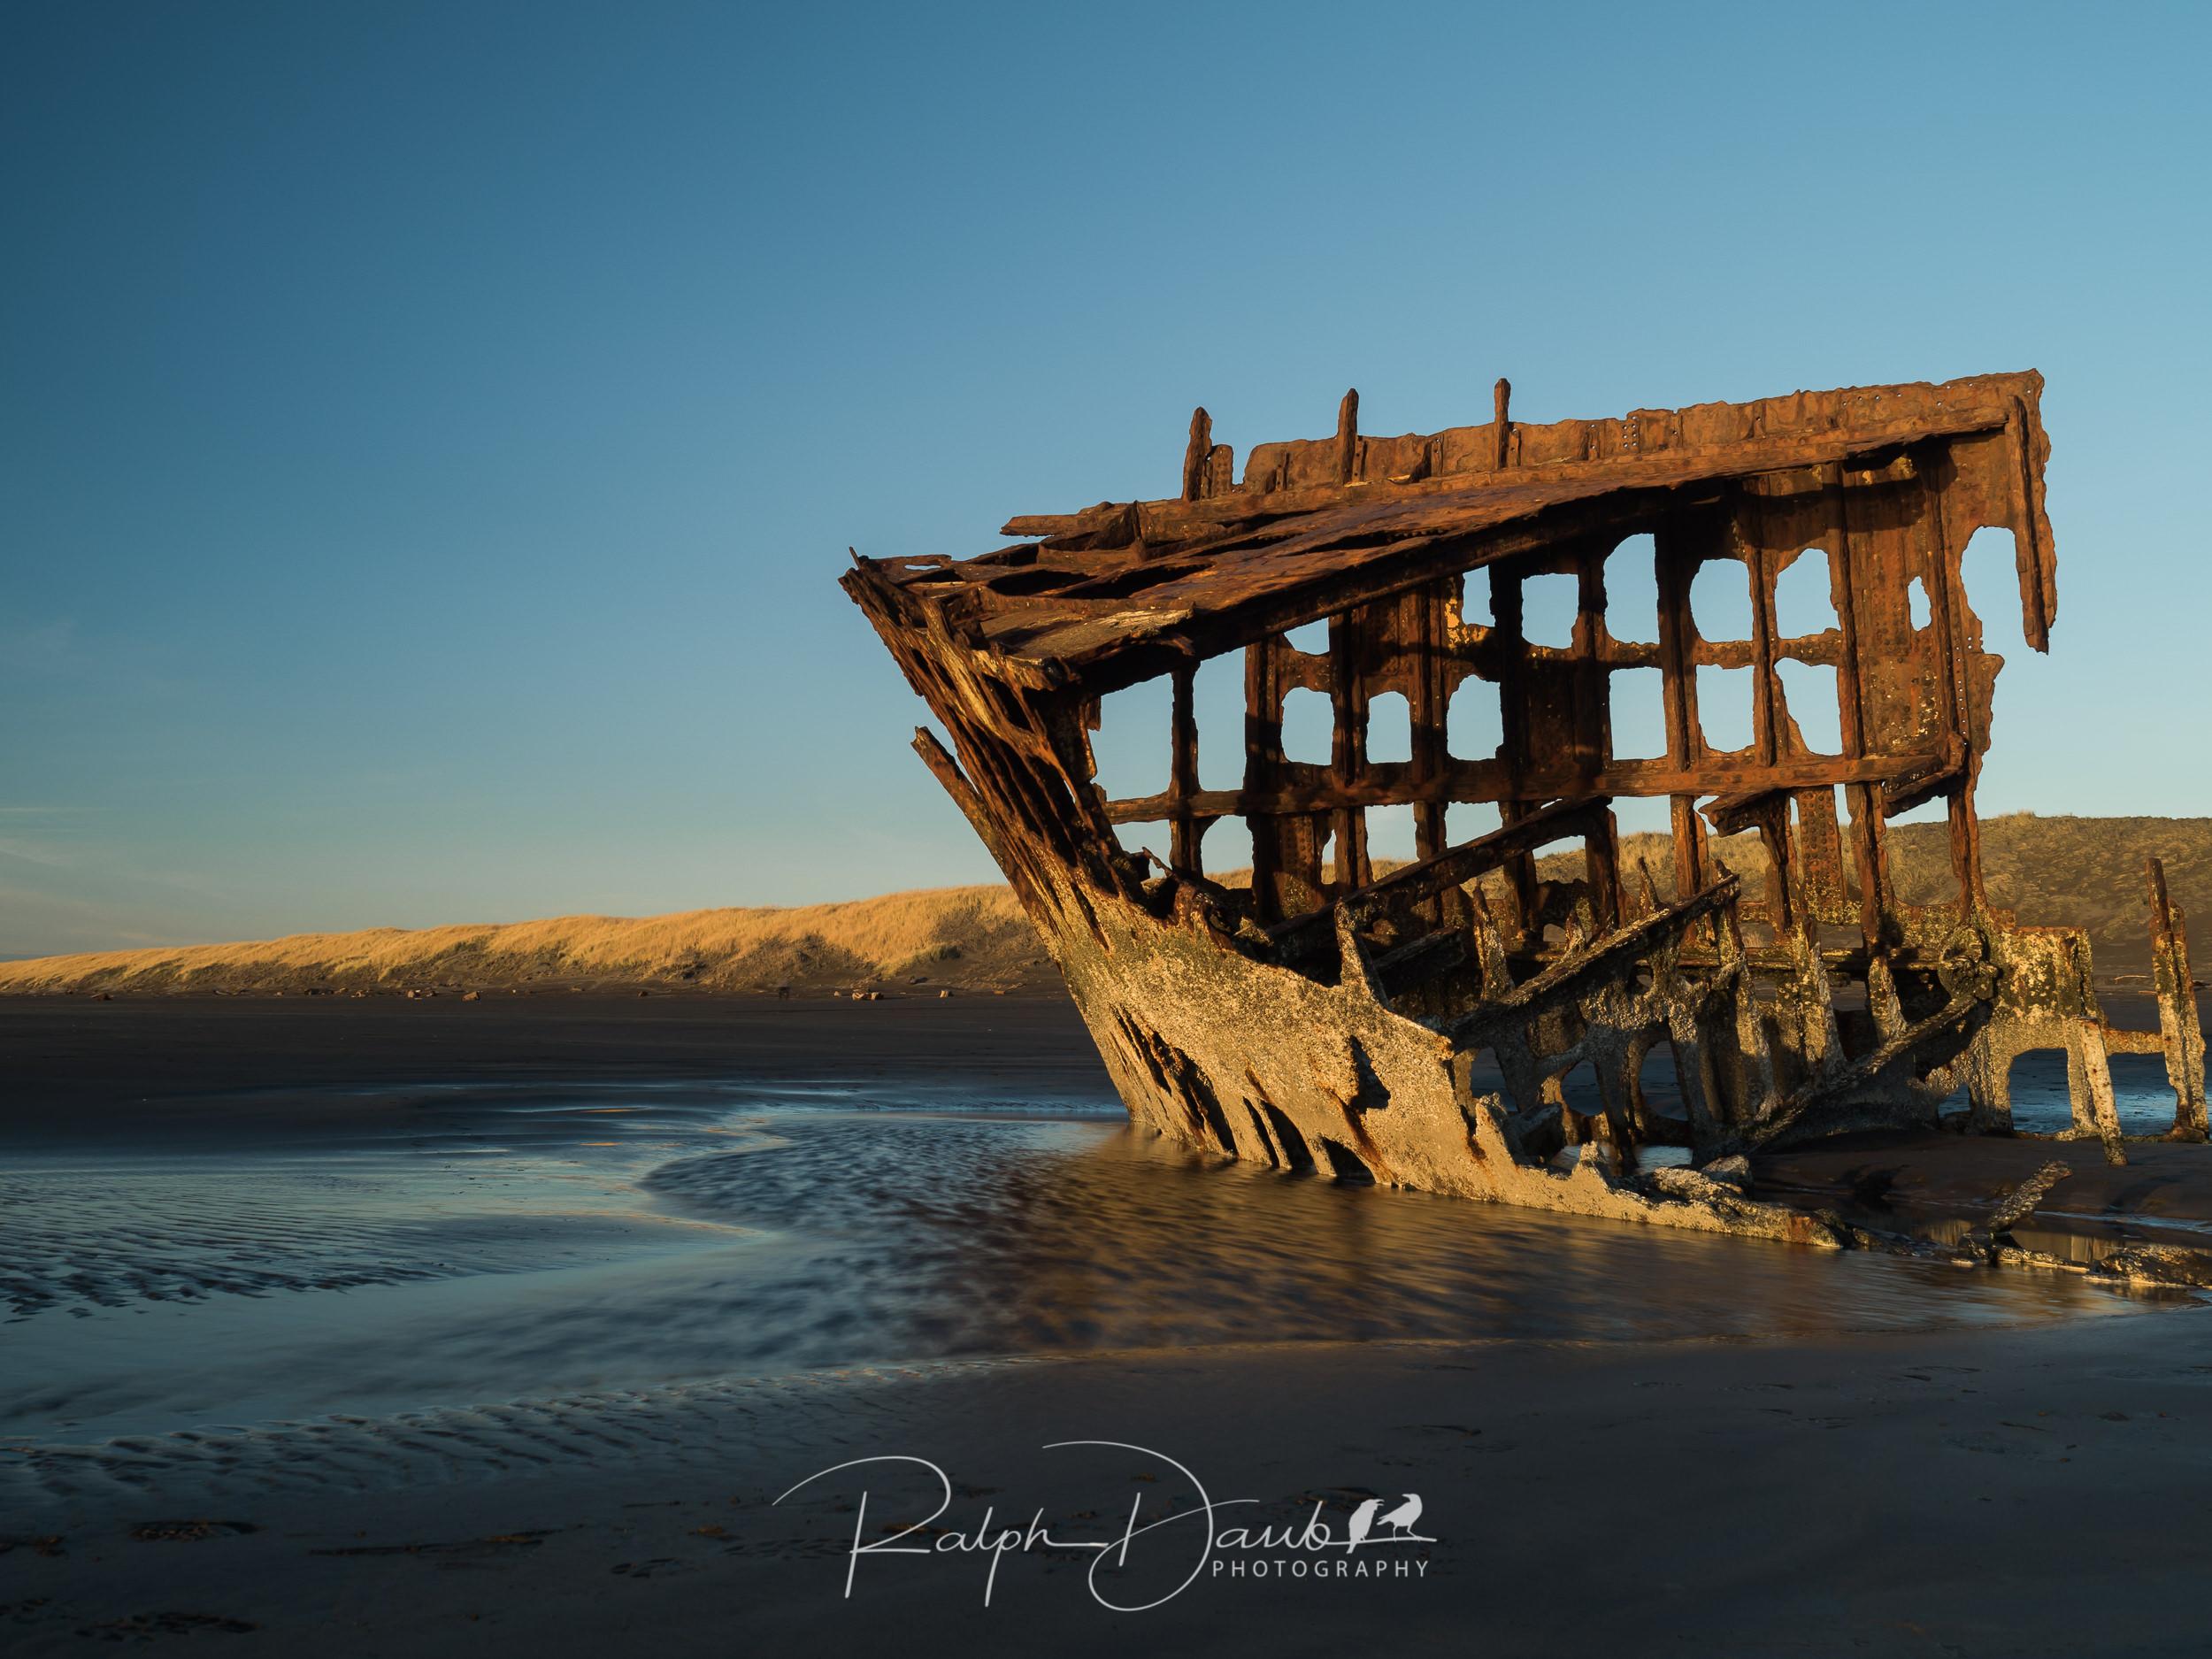 2017-12-04 - Peter Iredale Shipwreck - 17h04m.jpg